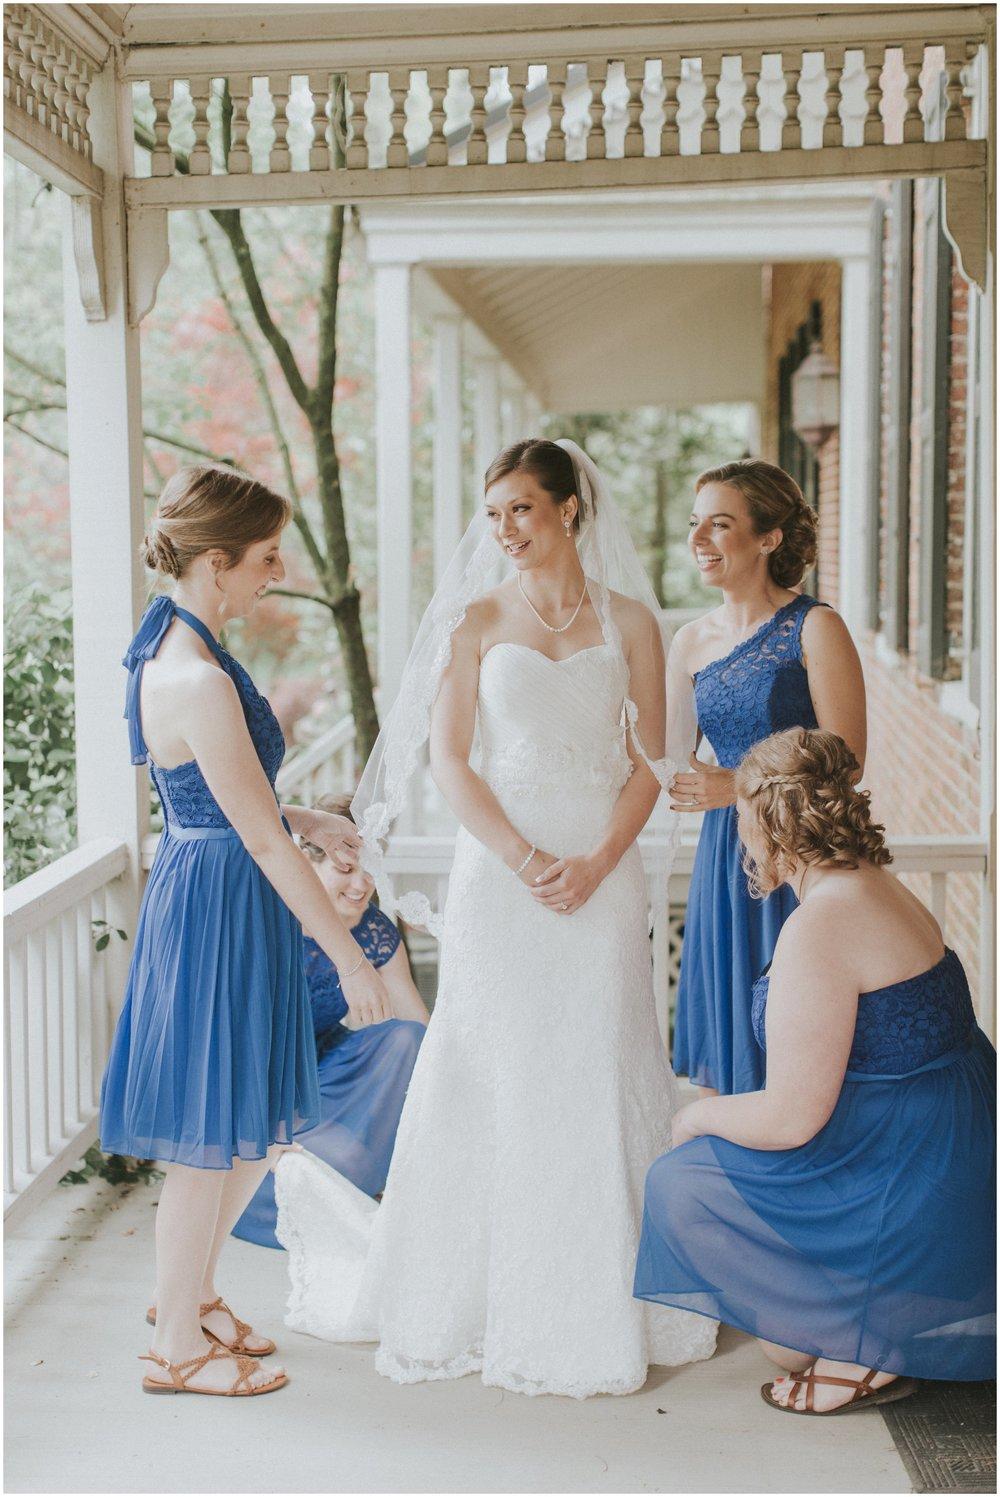 stone_mill_inn_wedding_0007.jpg